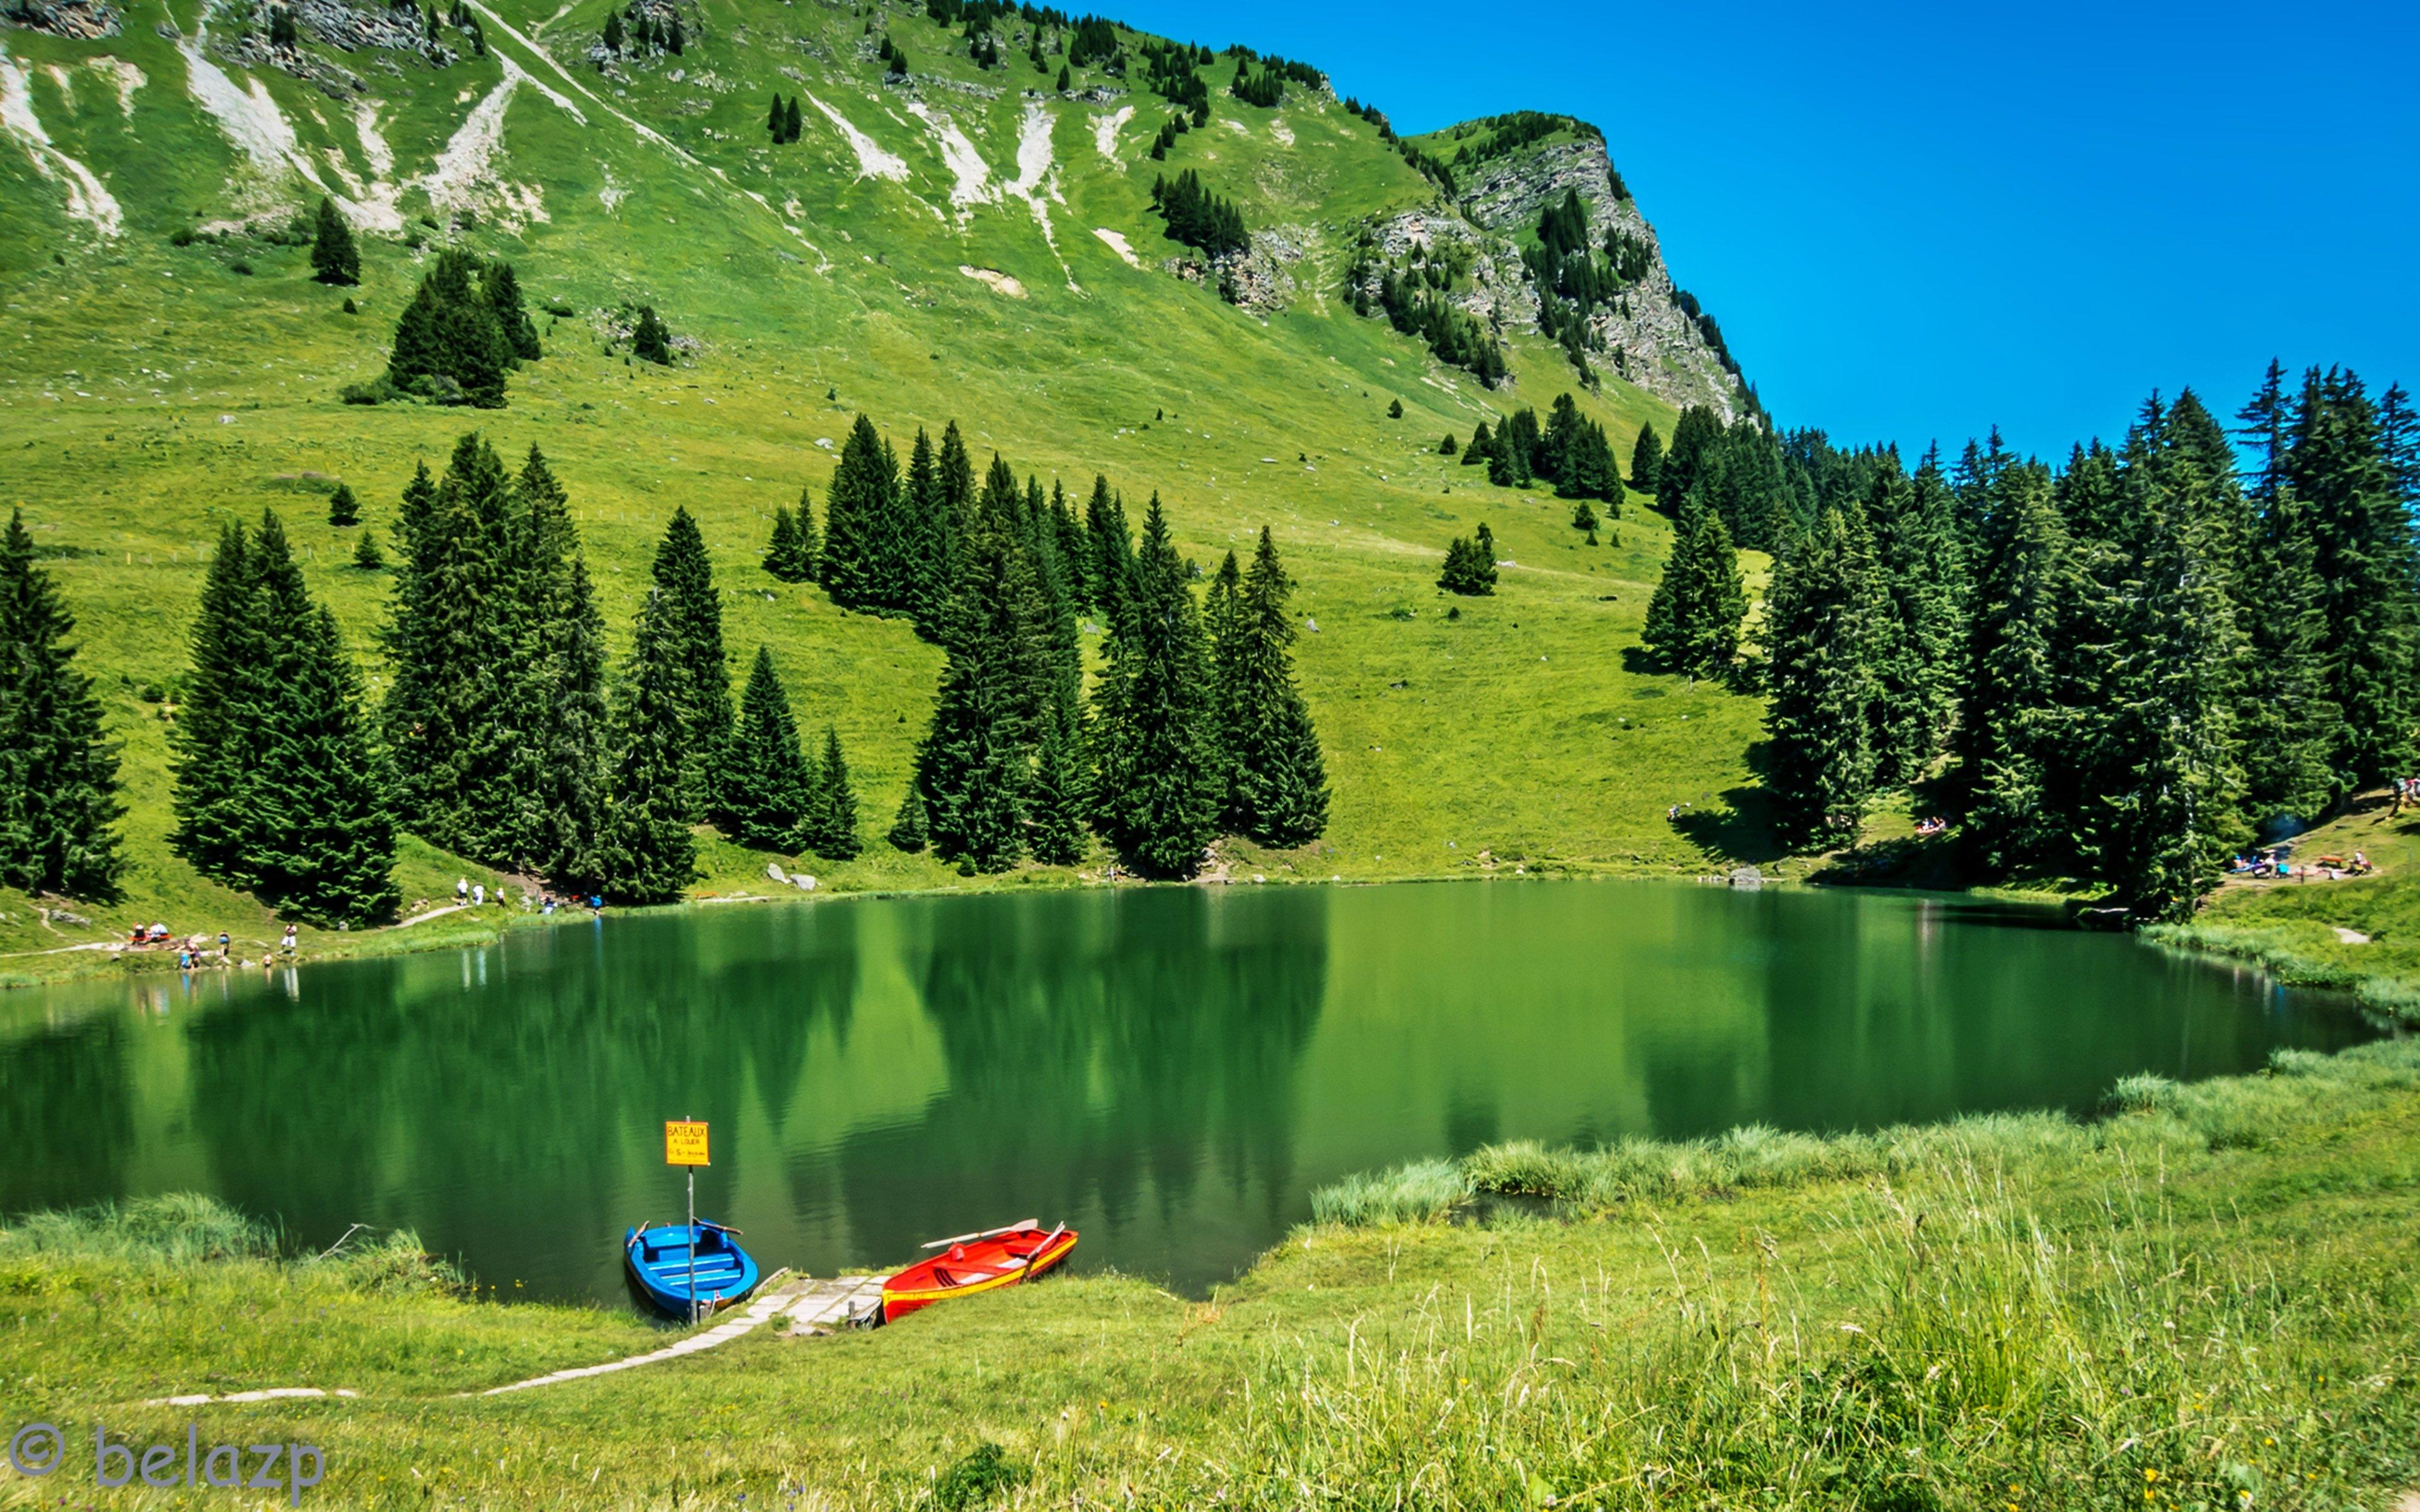 Great Wallpaper Mountain Green - a073ae6cca1cf71b15a9c2c4ea1c373f  Image_431142.jpg